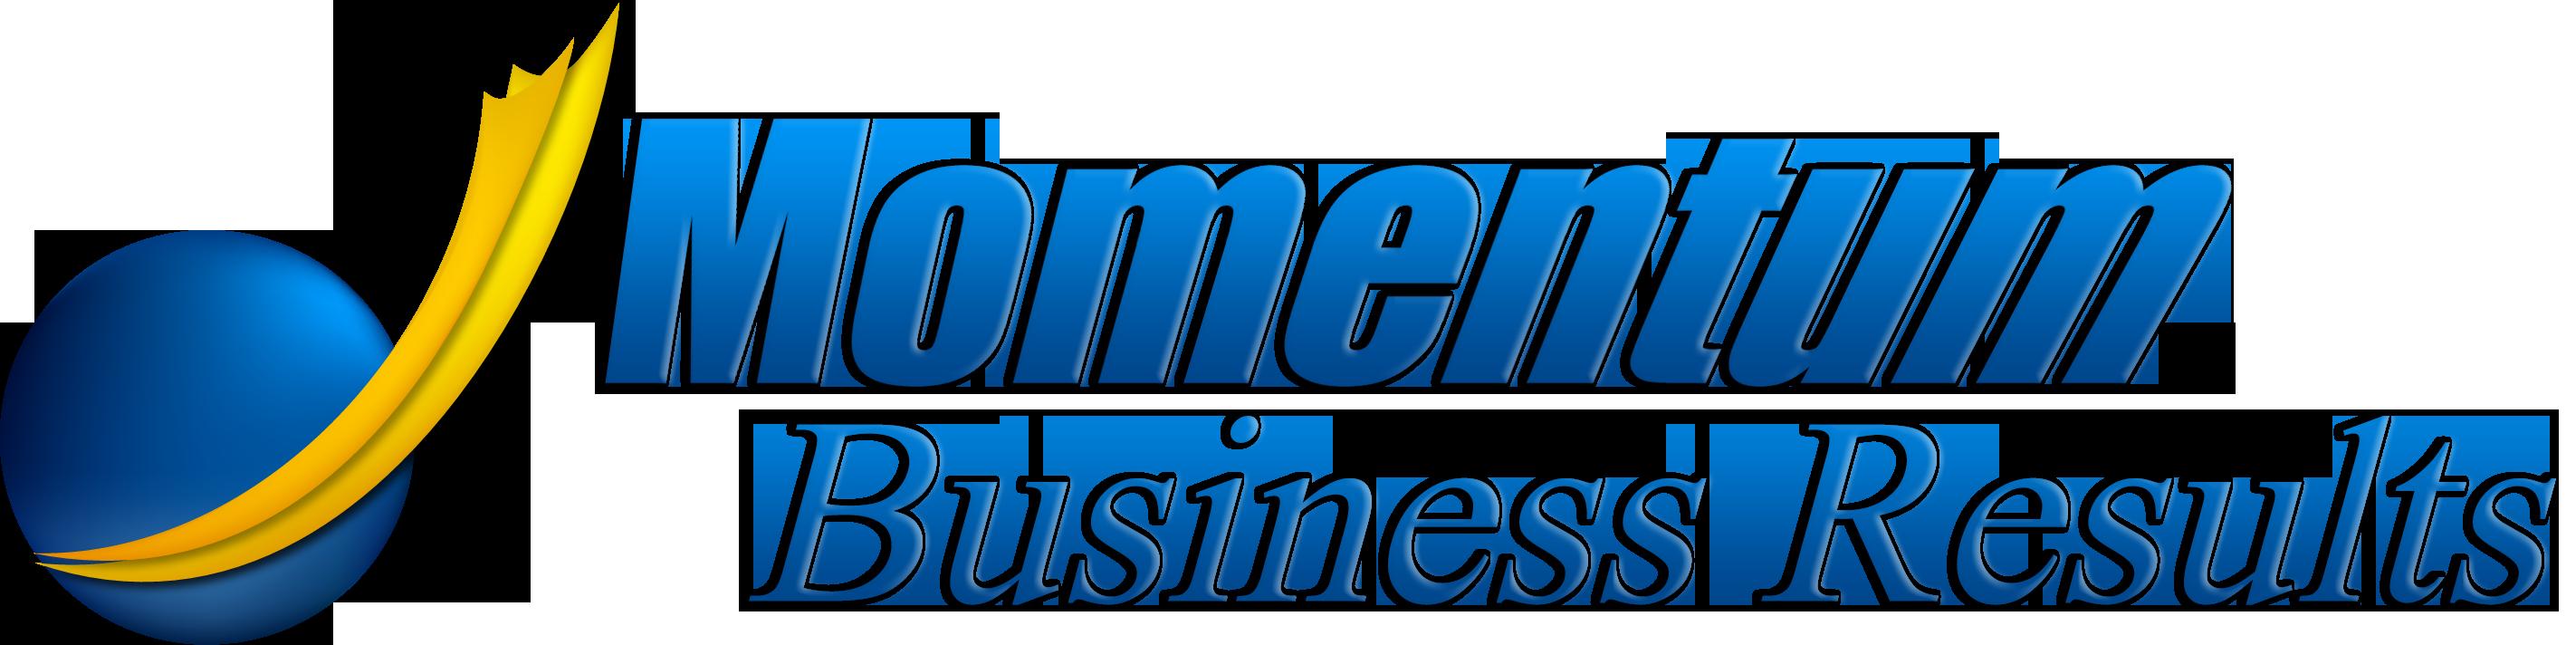 momentum business results logo jpeg